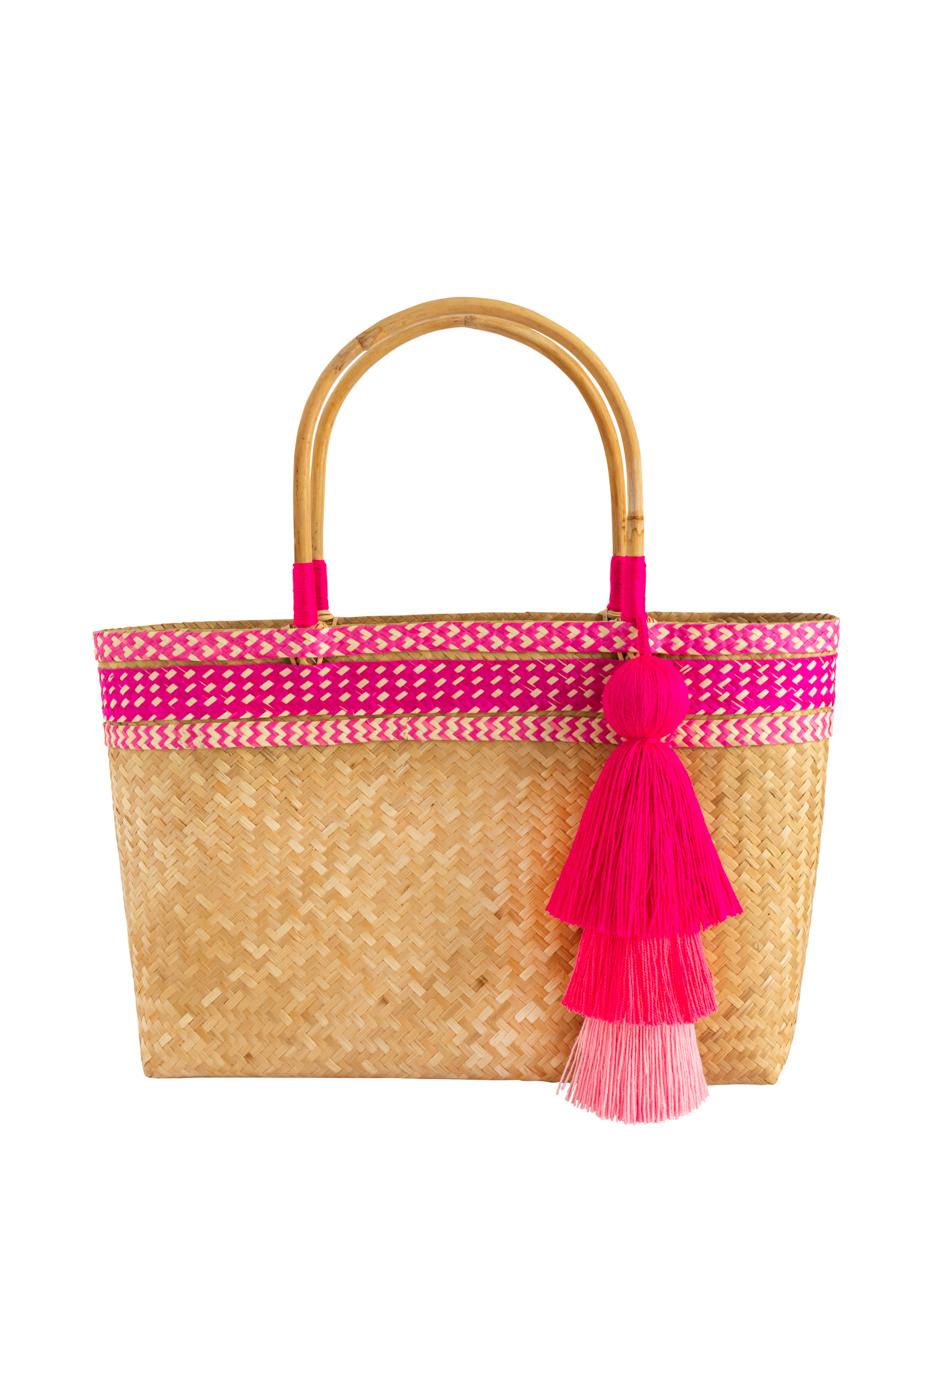 Fiber basket bag and fuchsia caña flecha